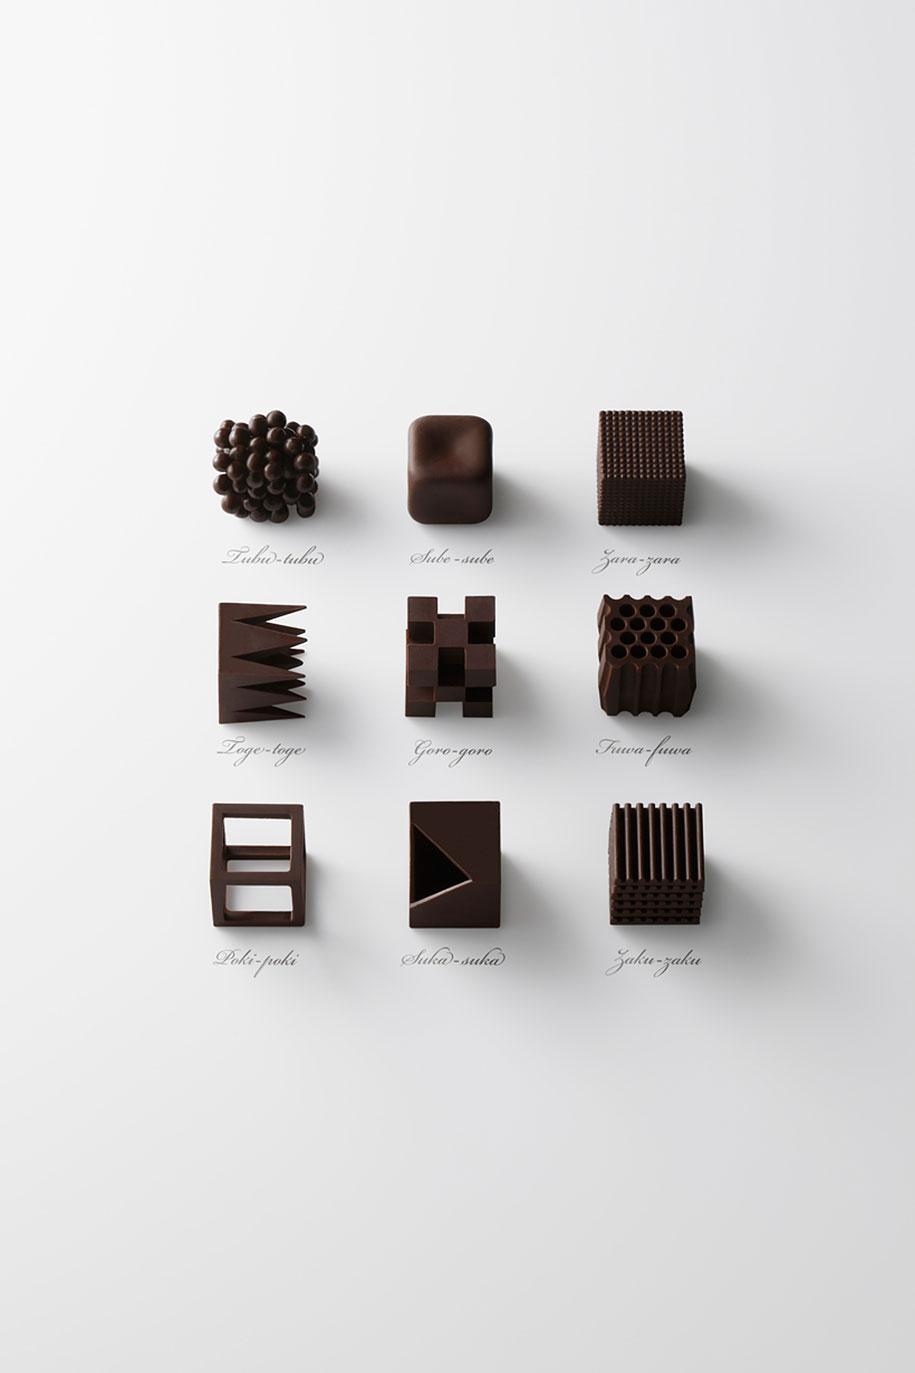 chocolatexture-japanese-expressions-nendo-oki-sato-16